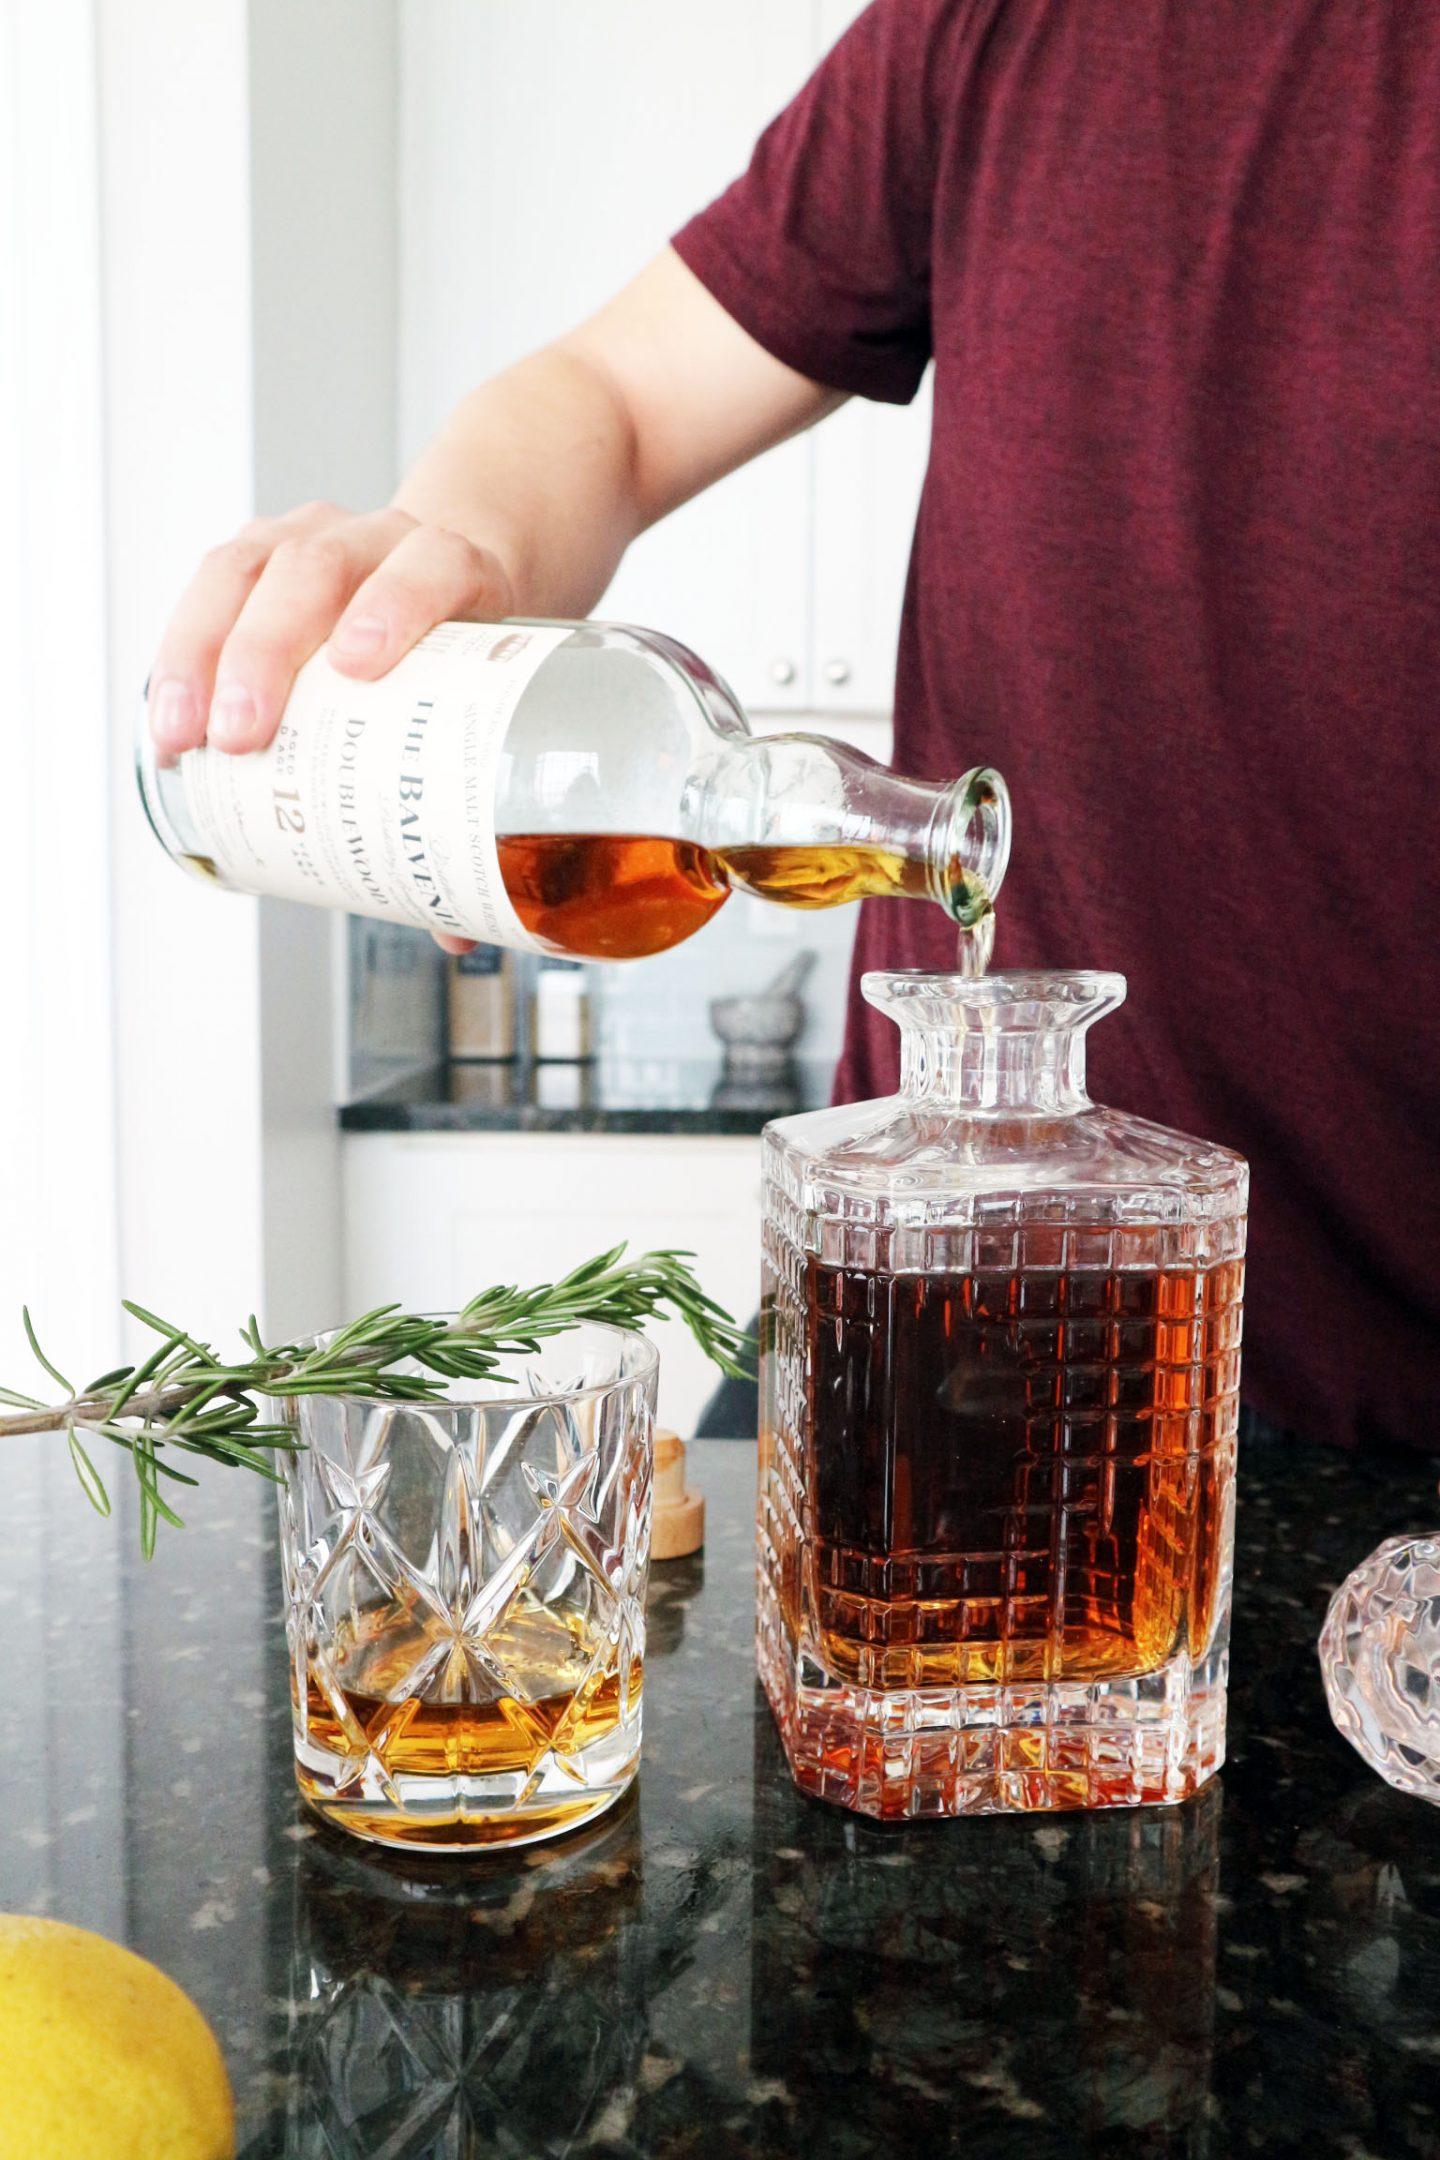 GIFTING ALCOHOL